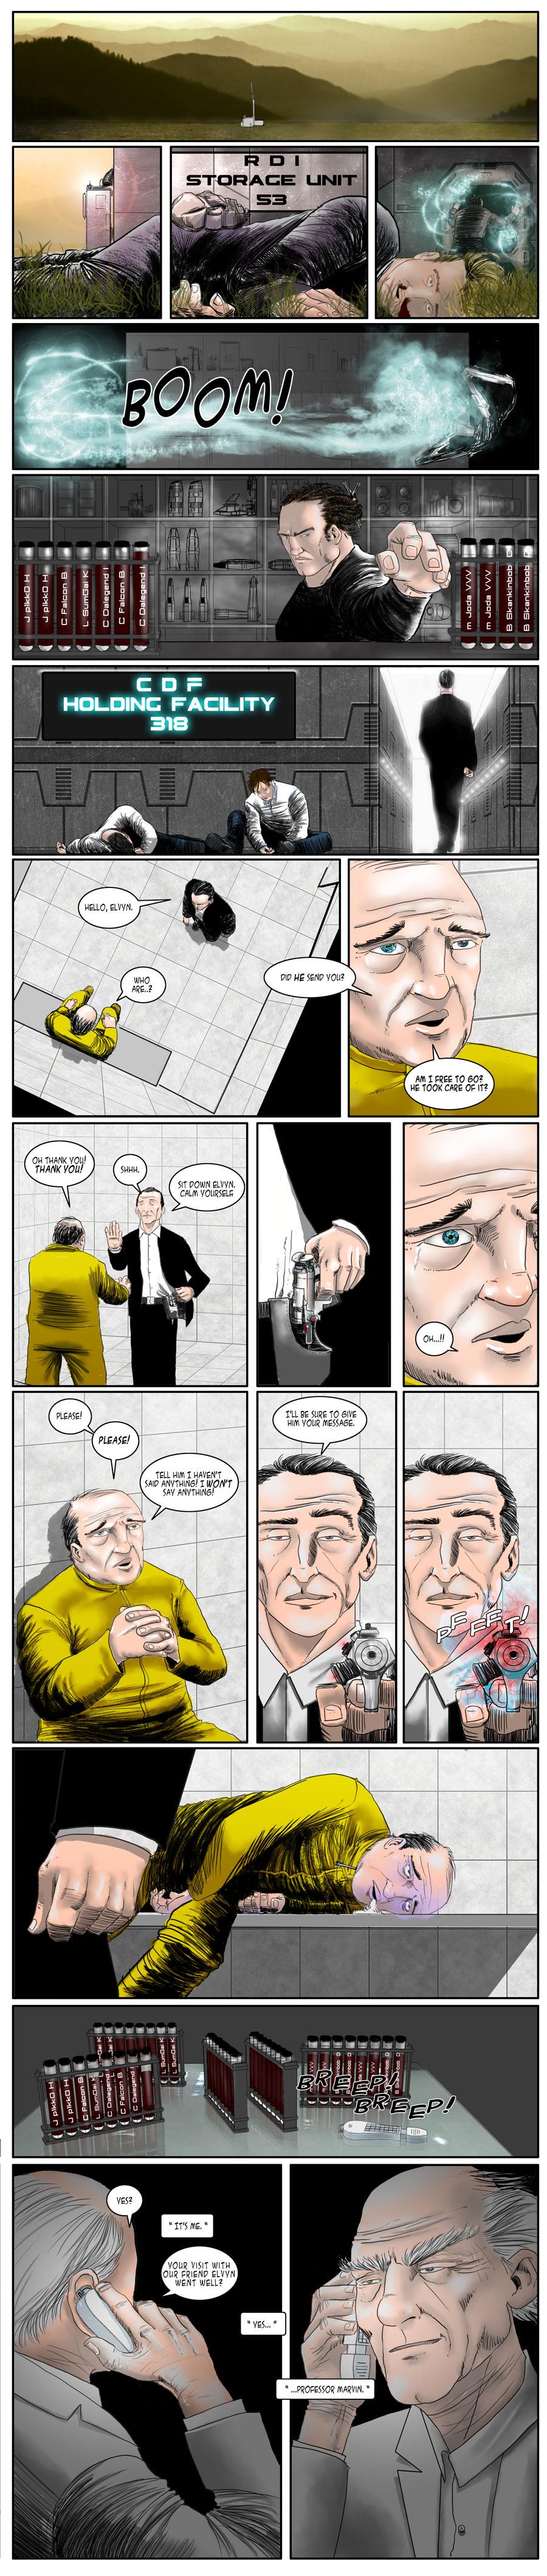 Eomon Migration 2014 storyline comic part 03 - Puppet Master.jpg